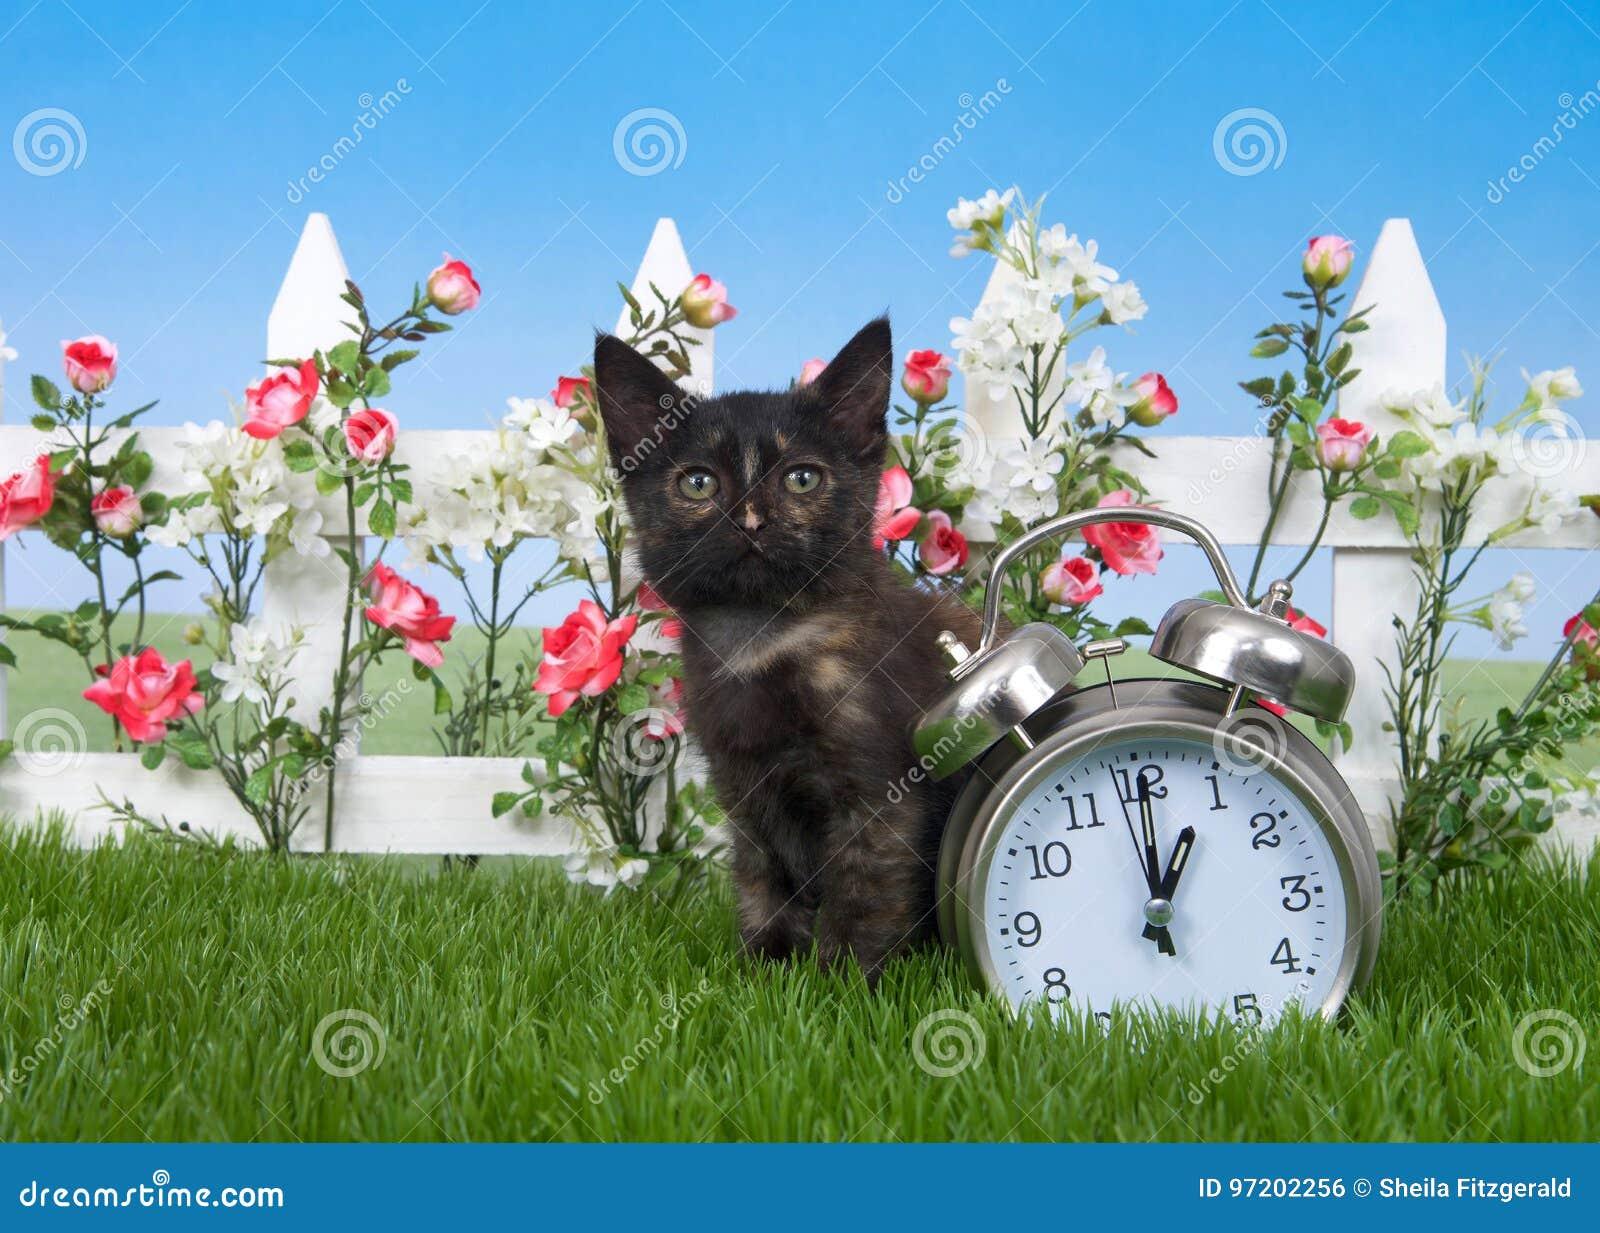 Tortie tabby kitten daylight savings concept in garden